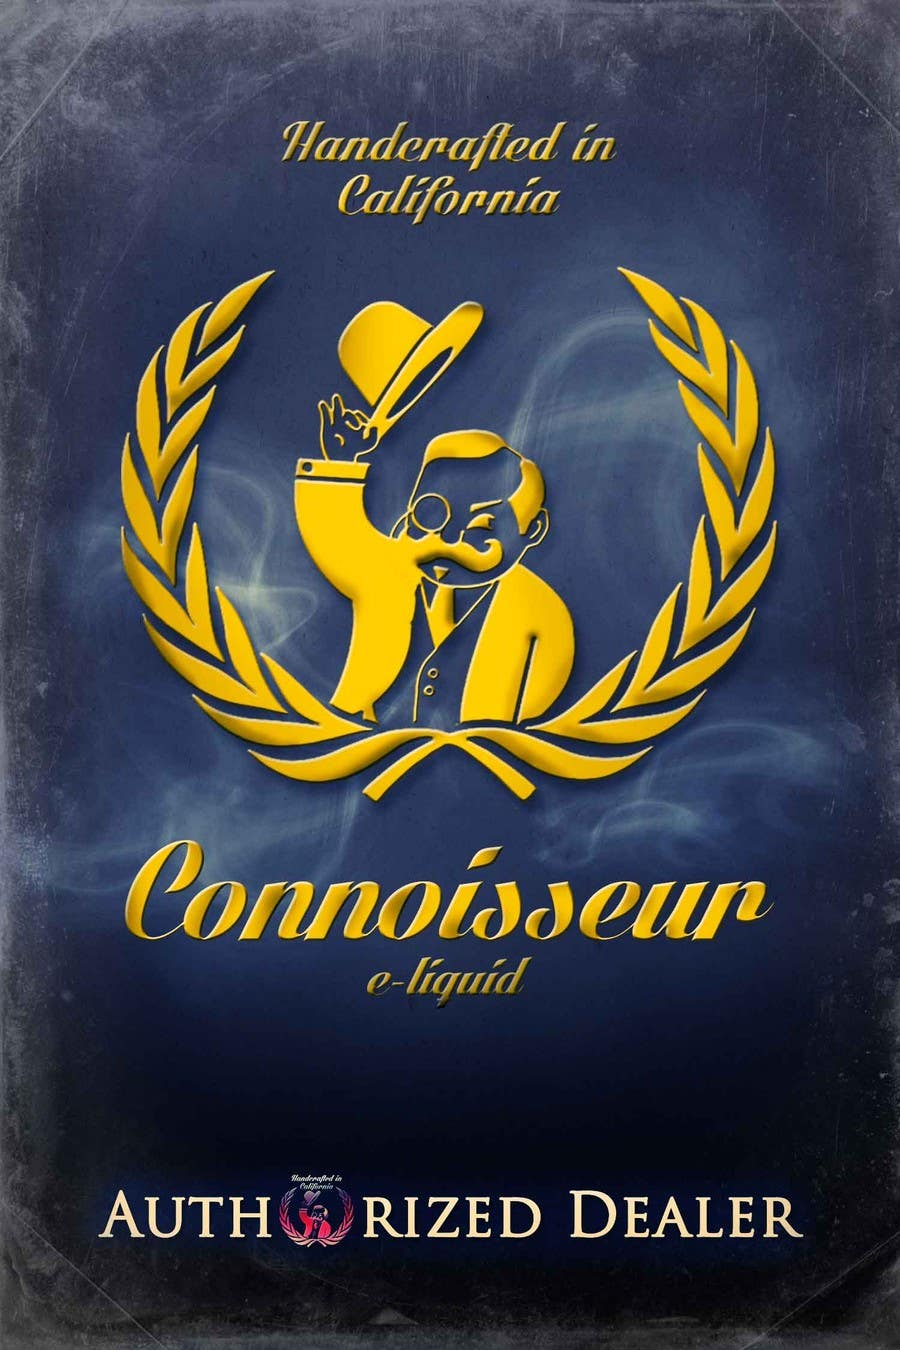 Bài tham dự cuộc thi #34 cho Poster Design for Connoisseur eJuice